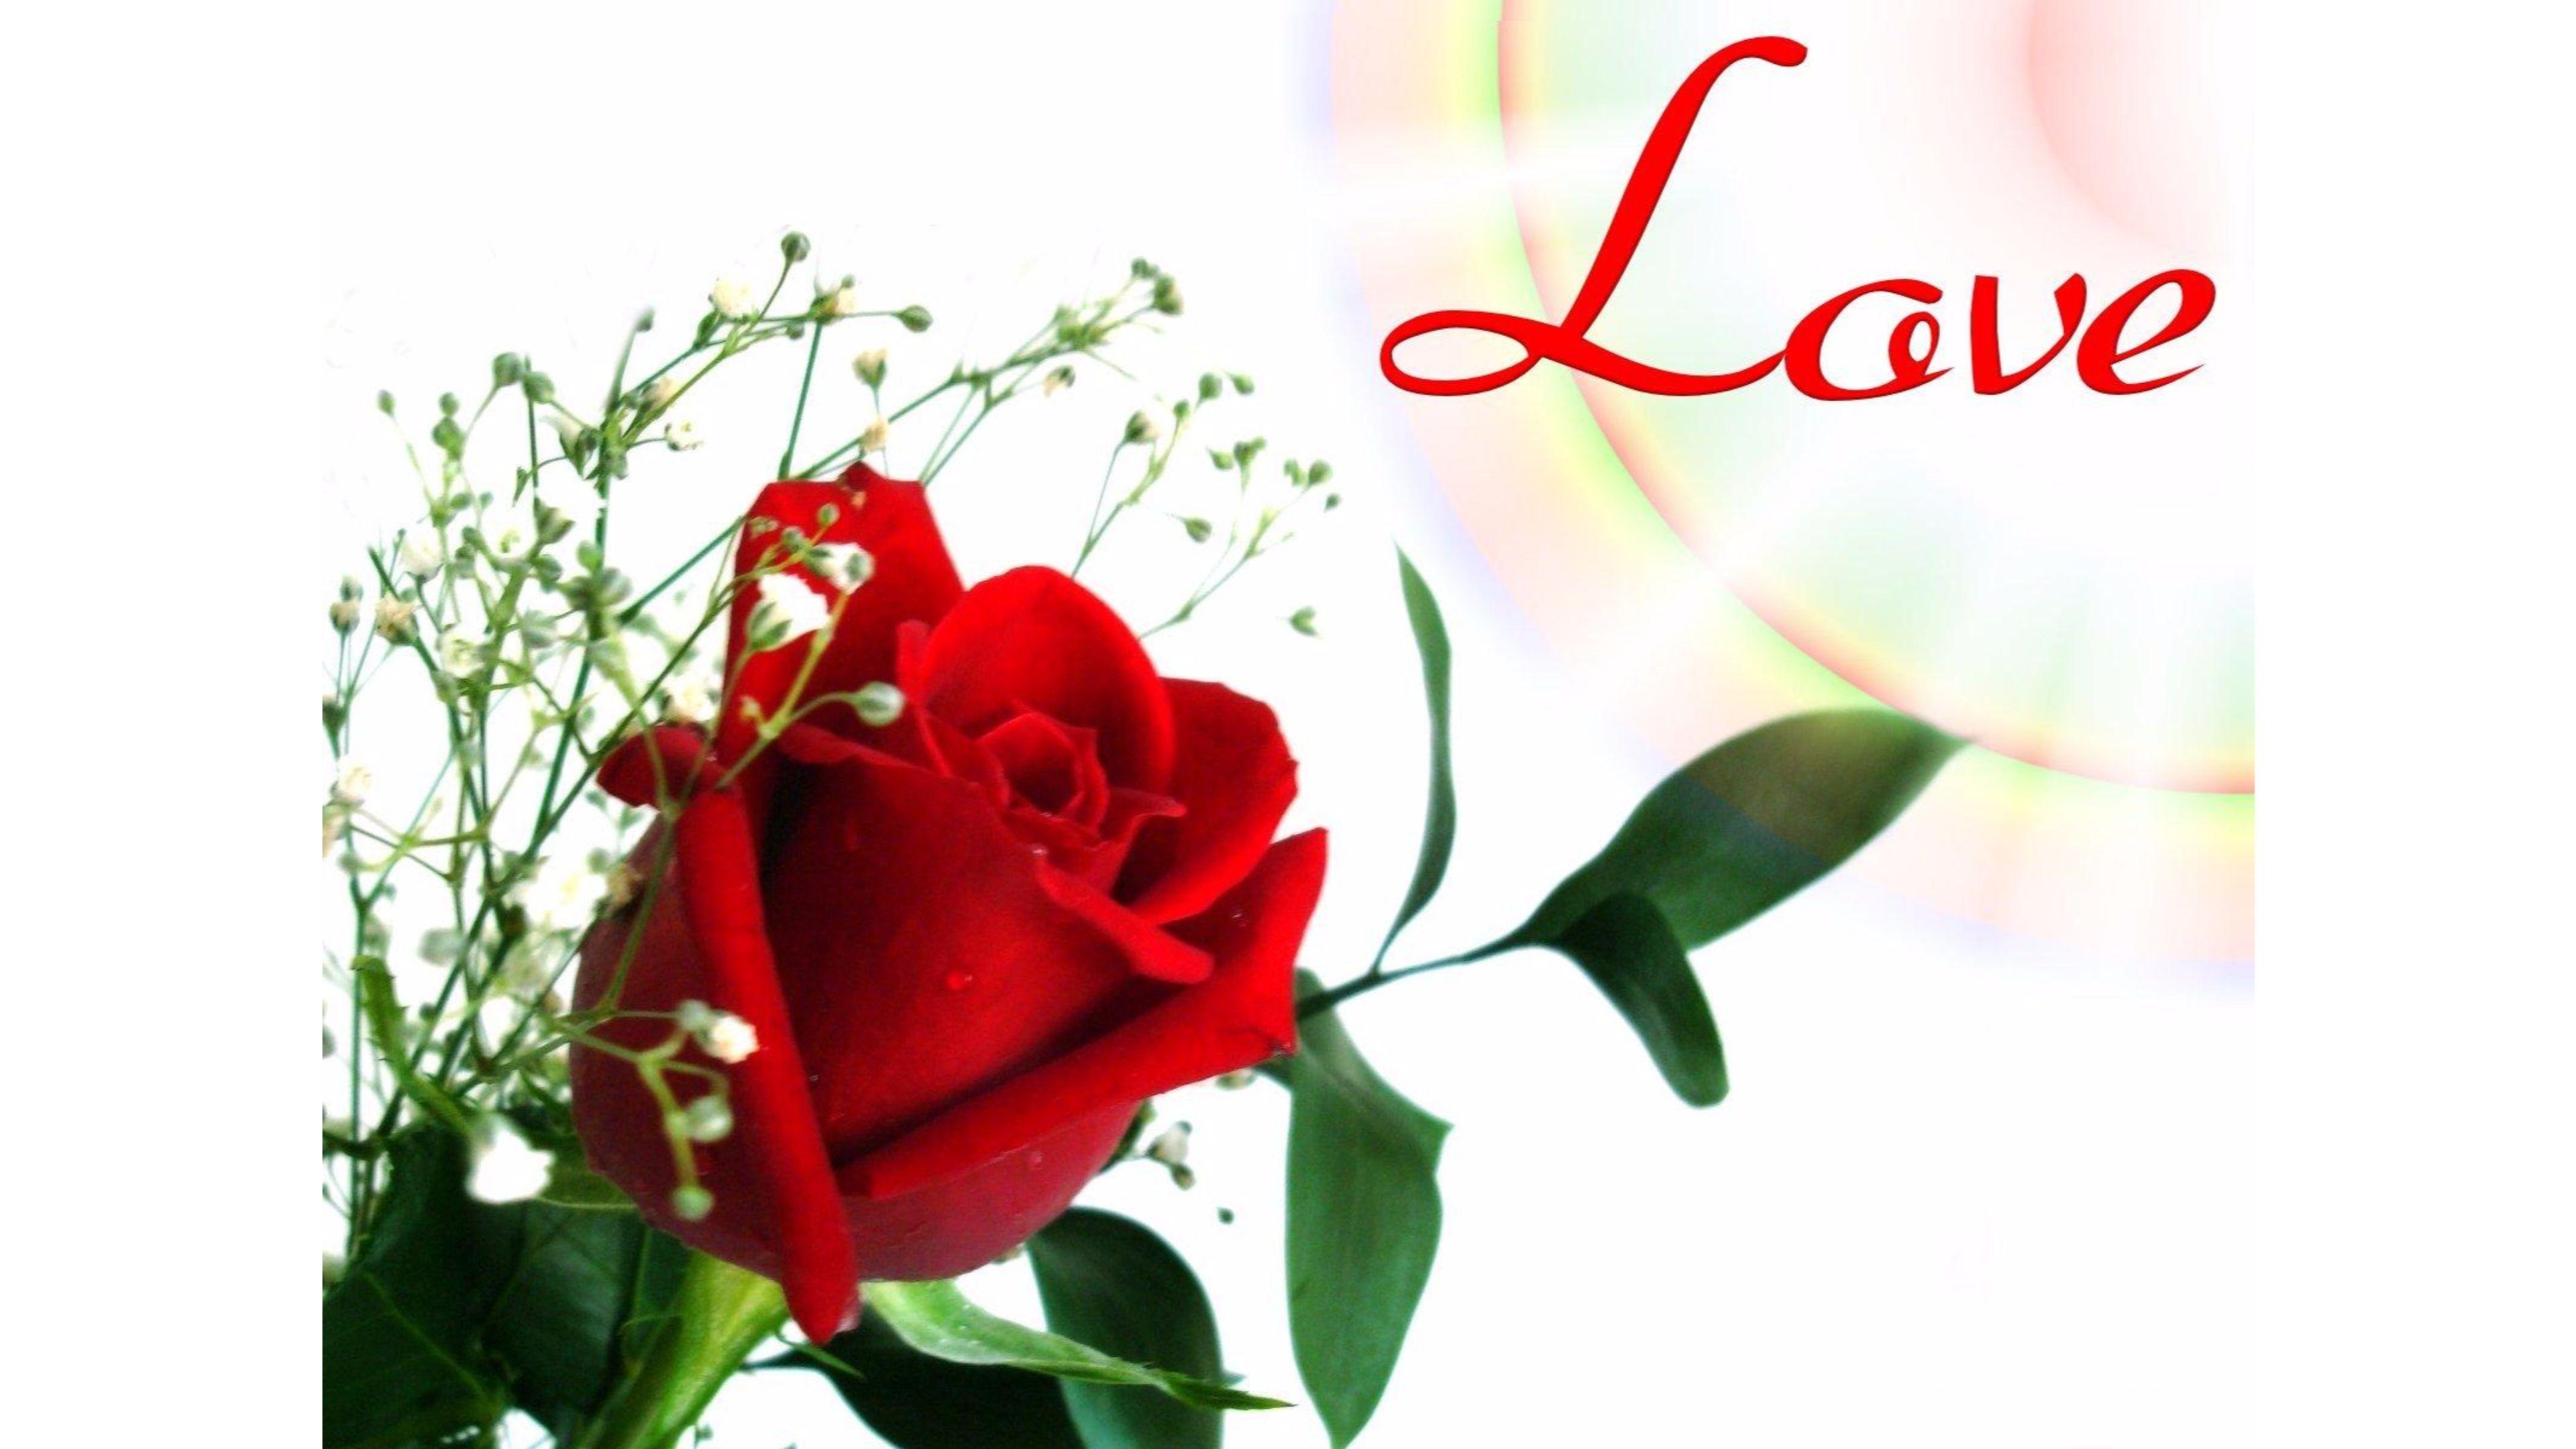 Single Rose Wallpapers Free Hd Pics Download